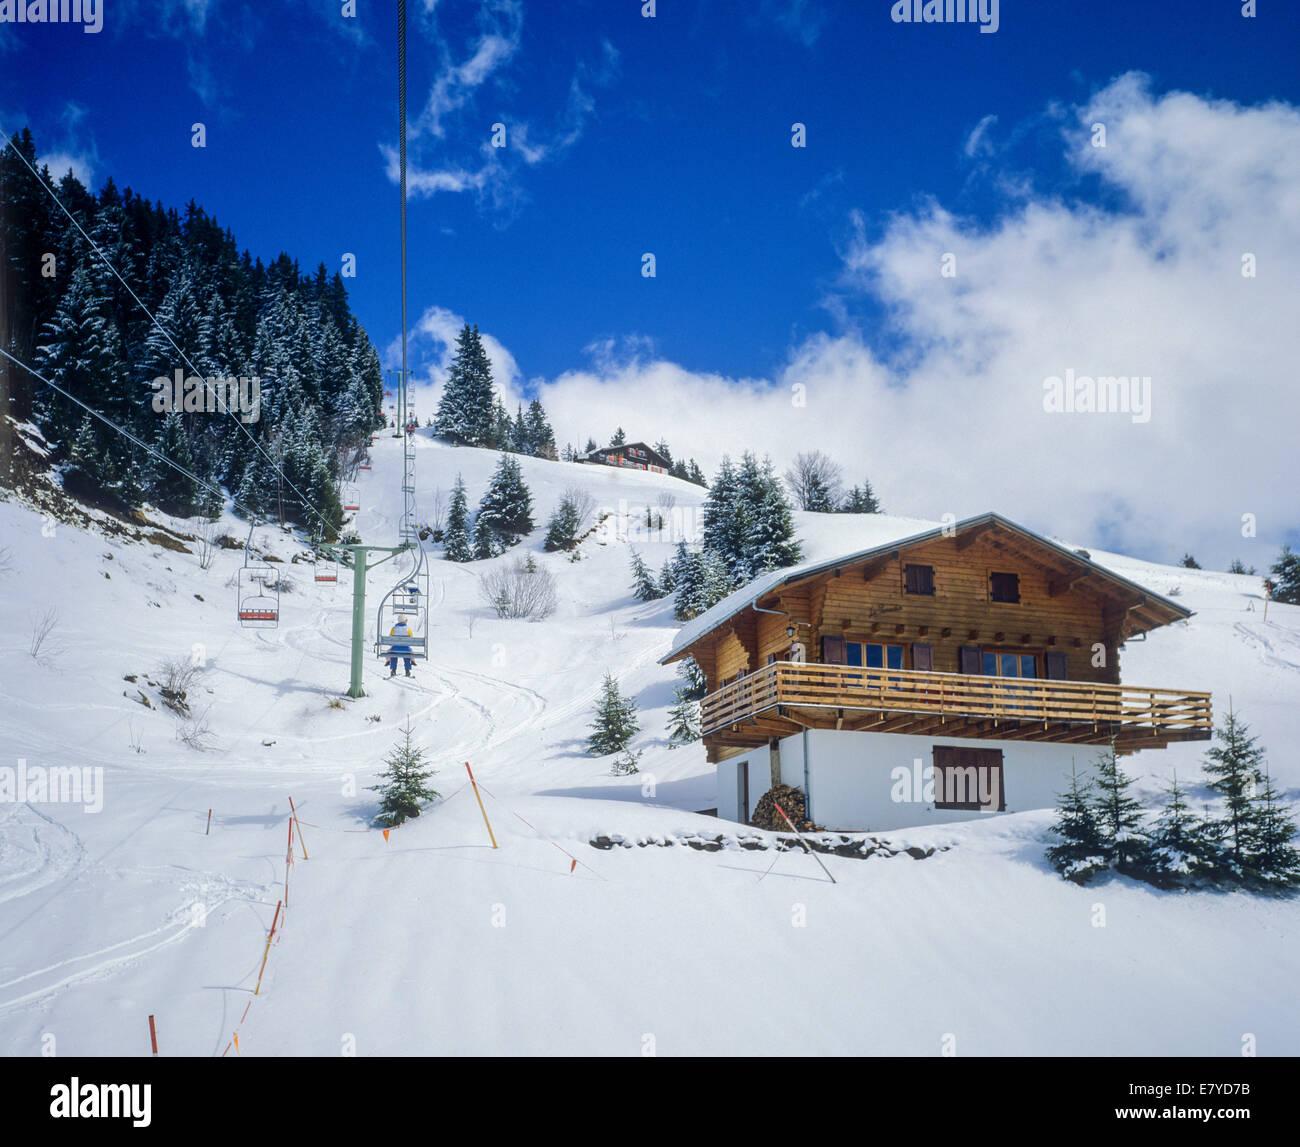 Chairlift and snowy chalet Morgins ski resort Les Portes du Soleil Swiss Alps Canton Valais Switzerland Europe Stock Photo